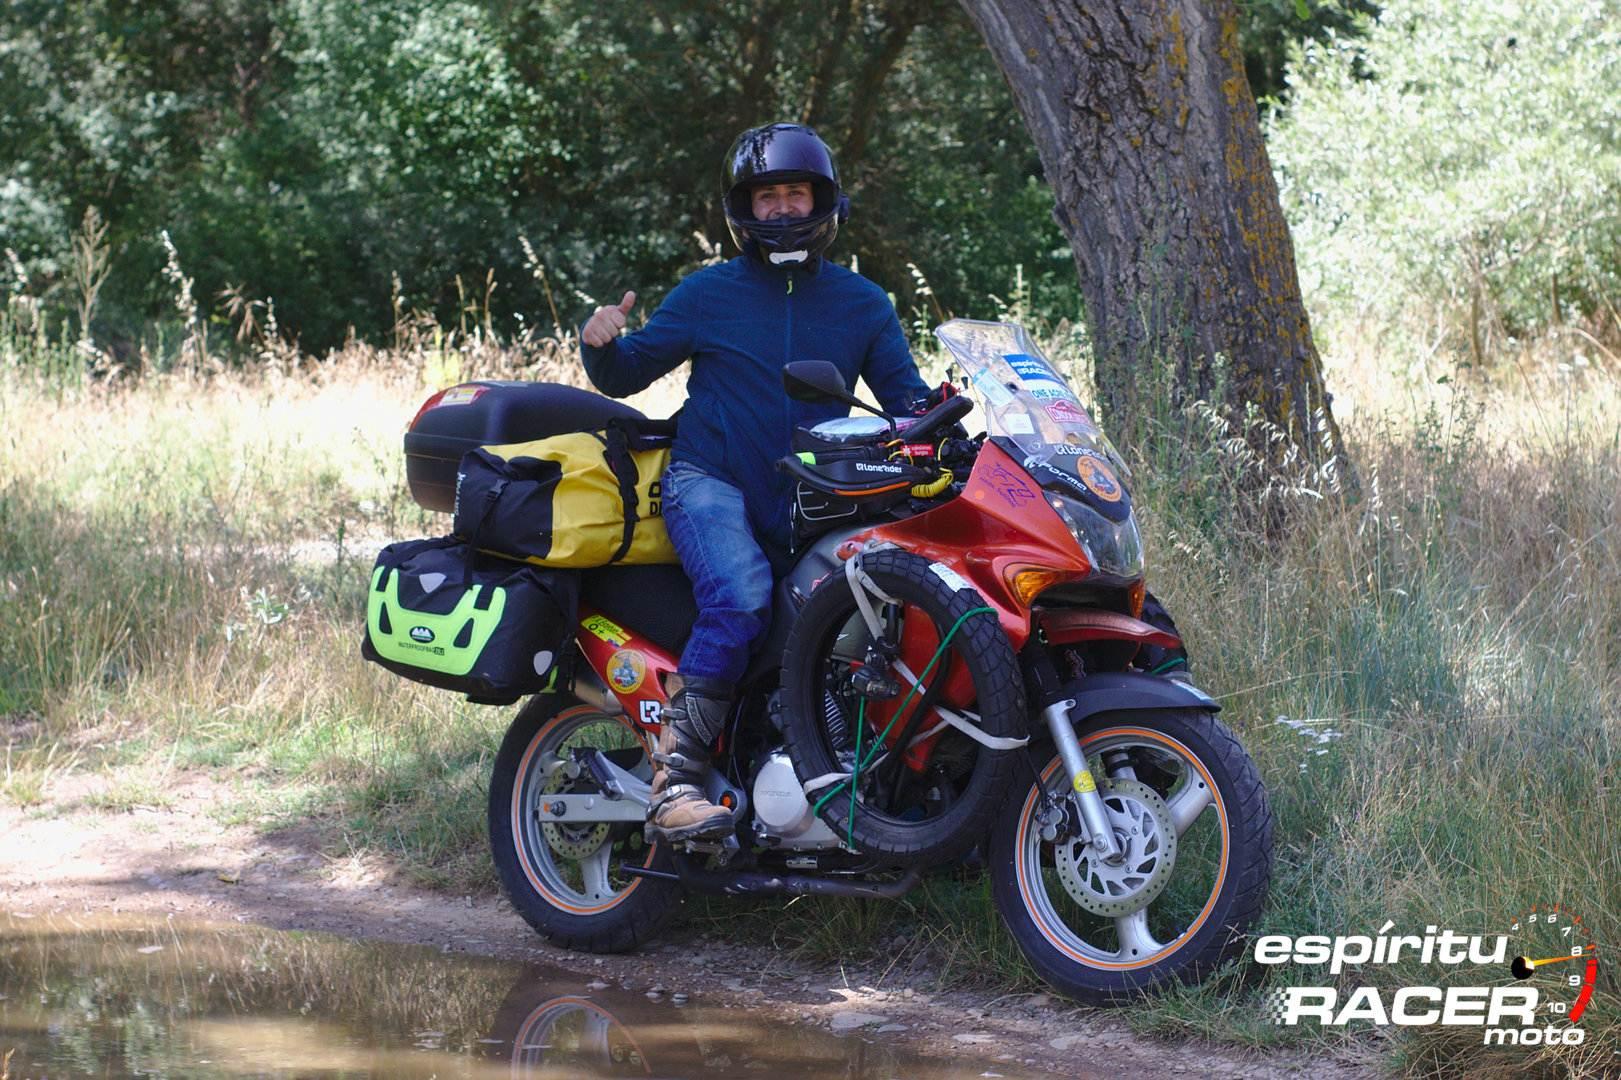 Pedro a Mongolia espirituRACER moto 03